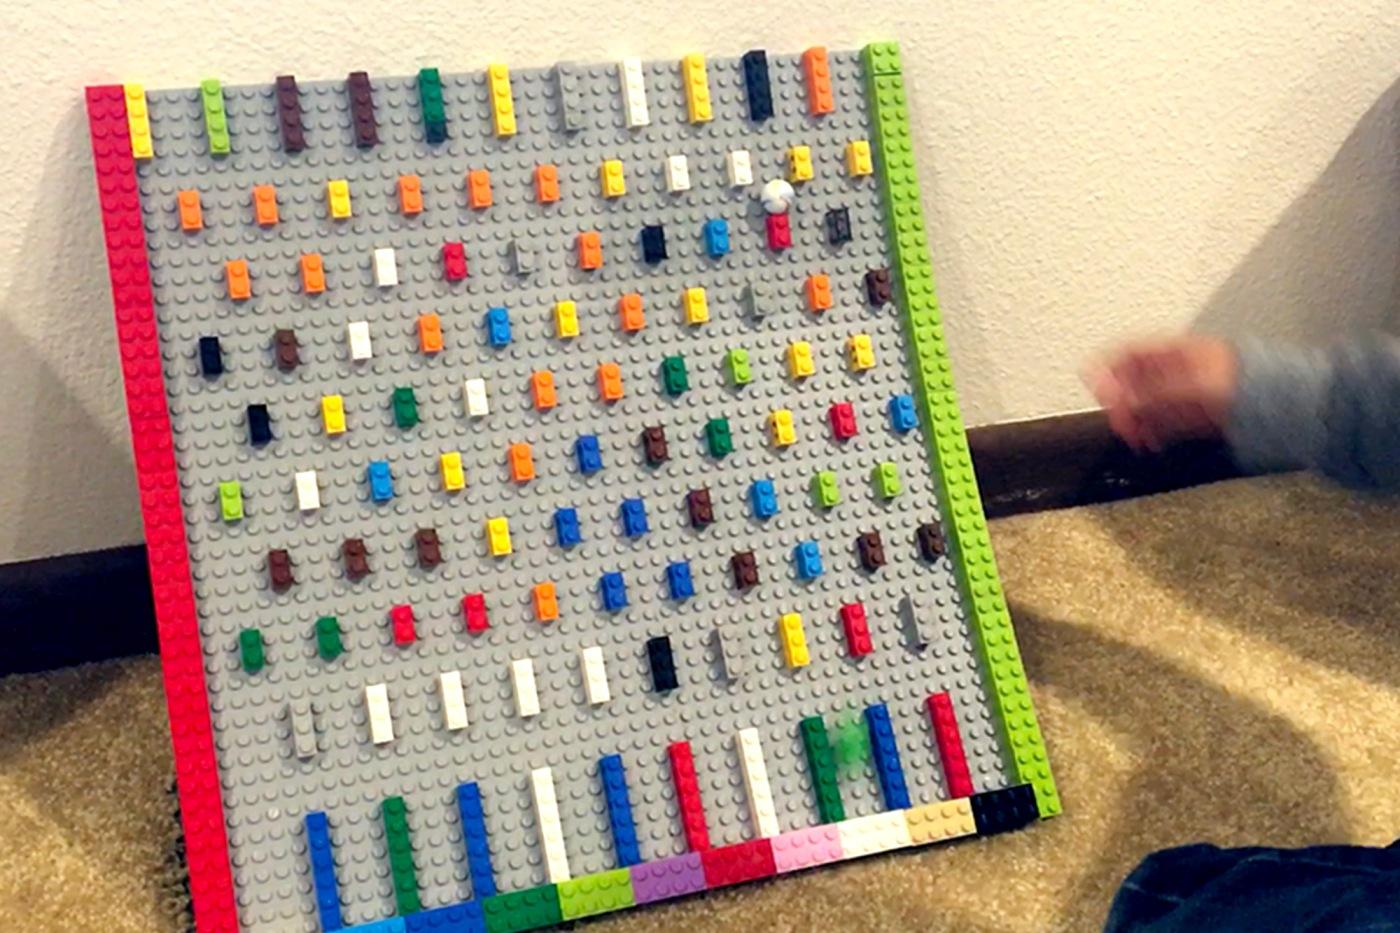 Making bean Machine (Galton board) with Lego